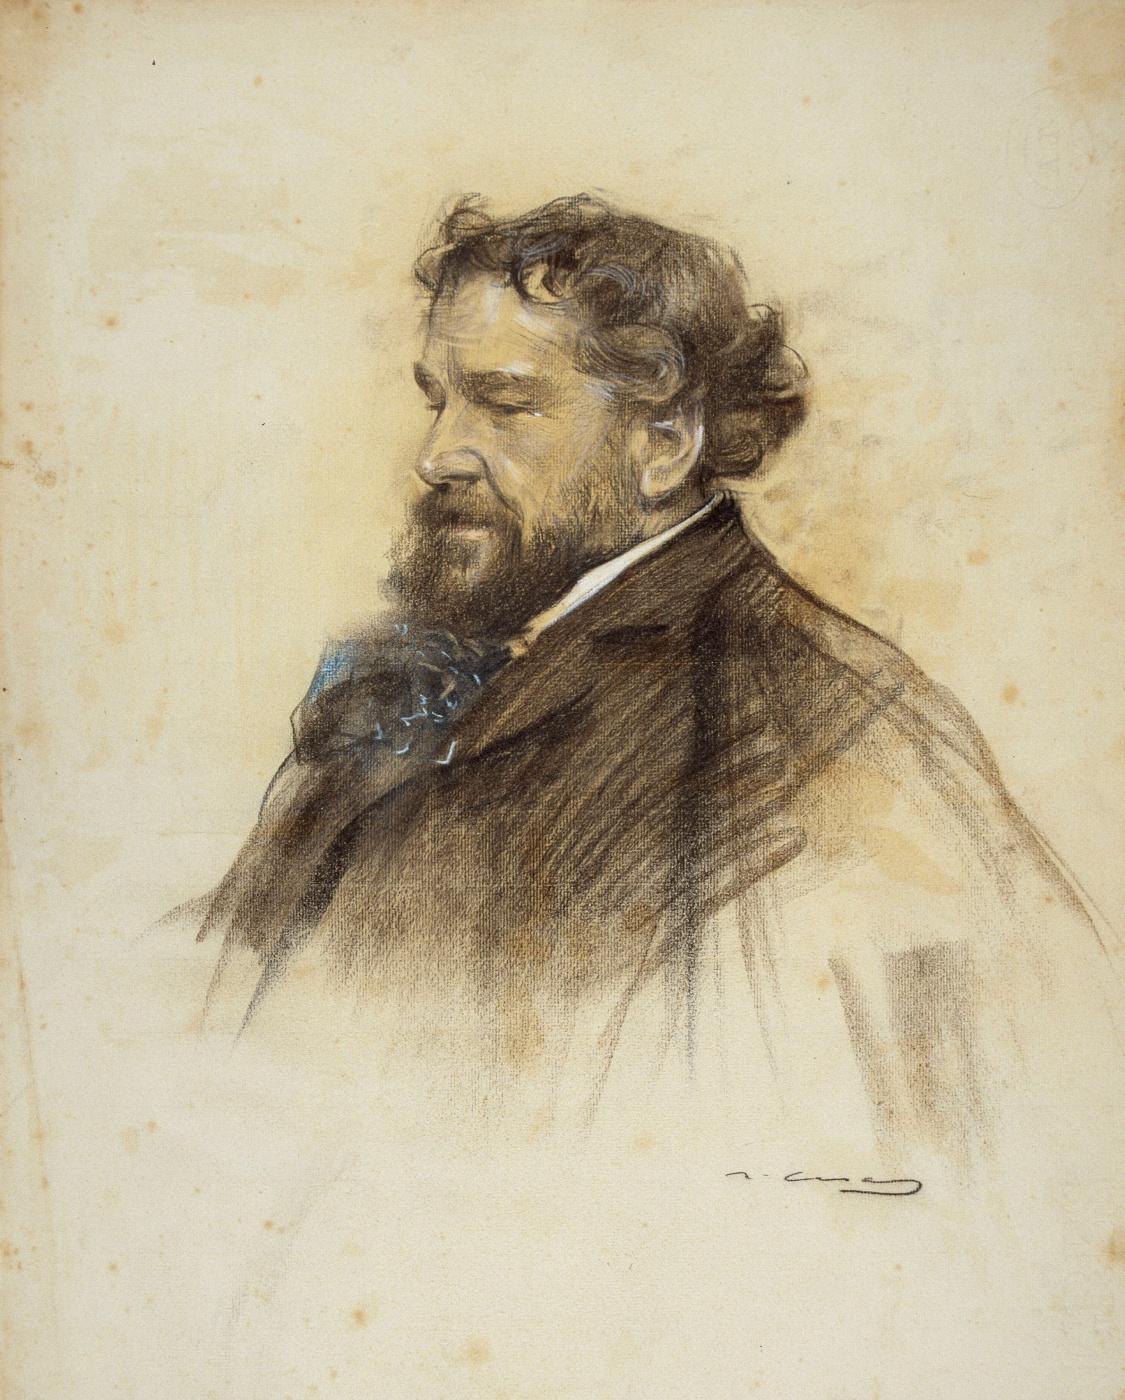 Ramon Casas i Carbó. Portrait of Octave Uzanne